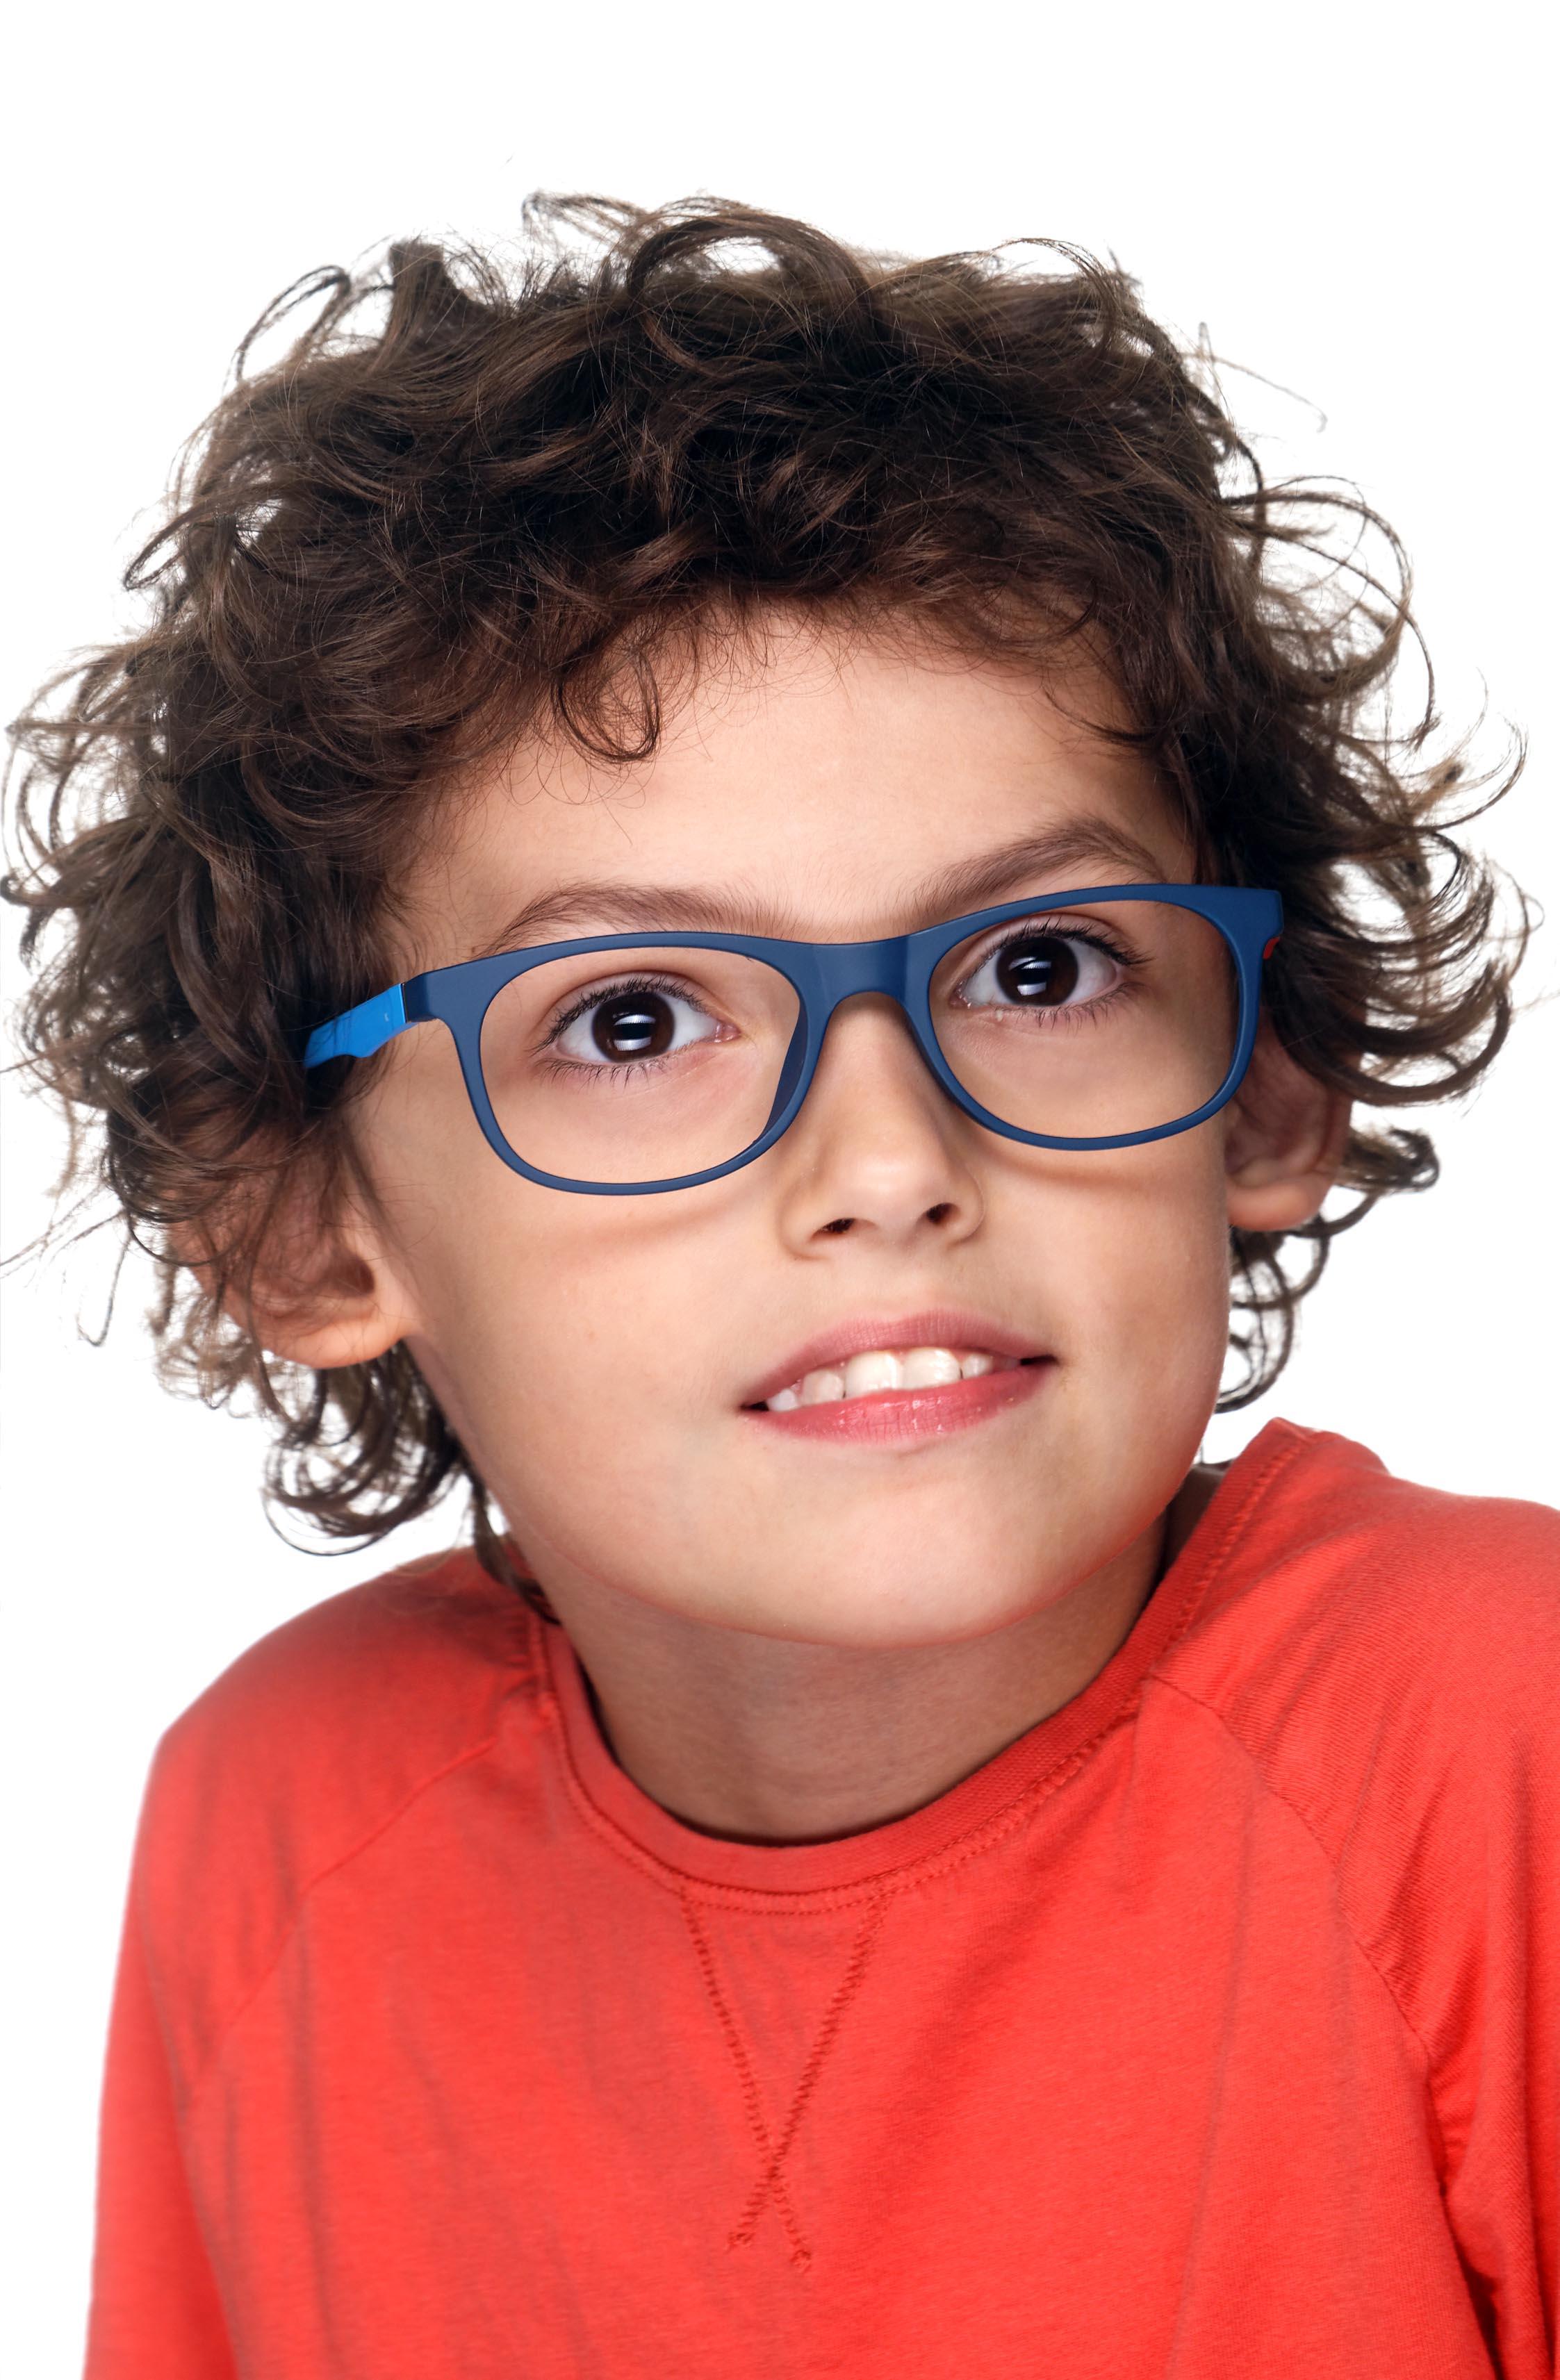 4_KWIAT HITS FOR KIDS_ K 5019 H (2)